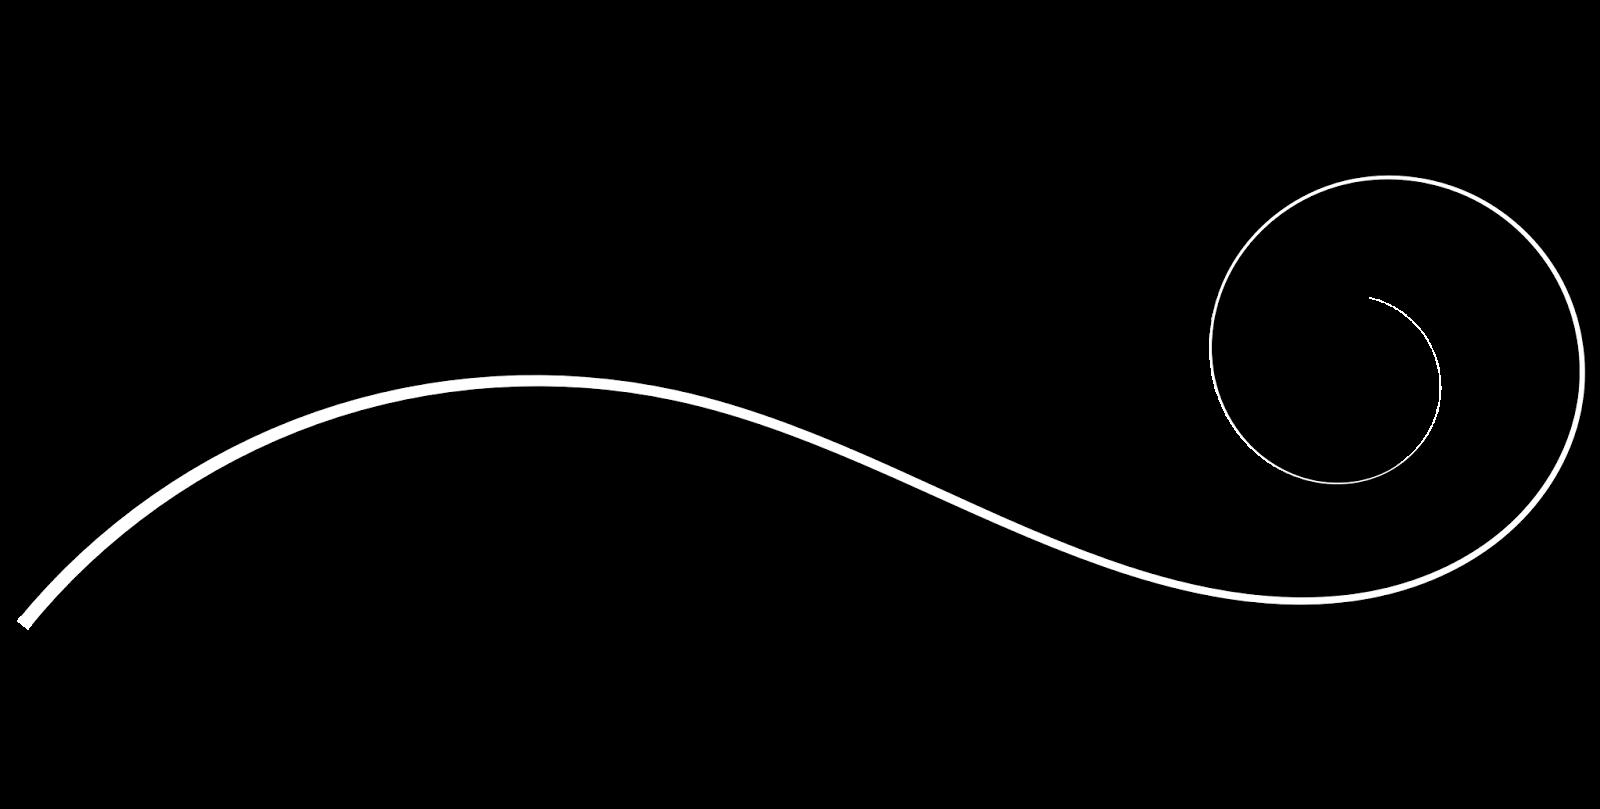 simple swirls